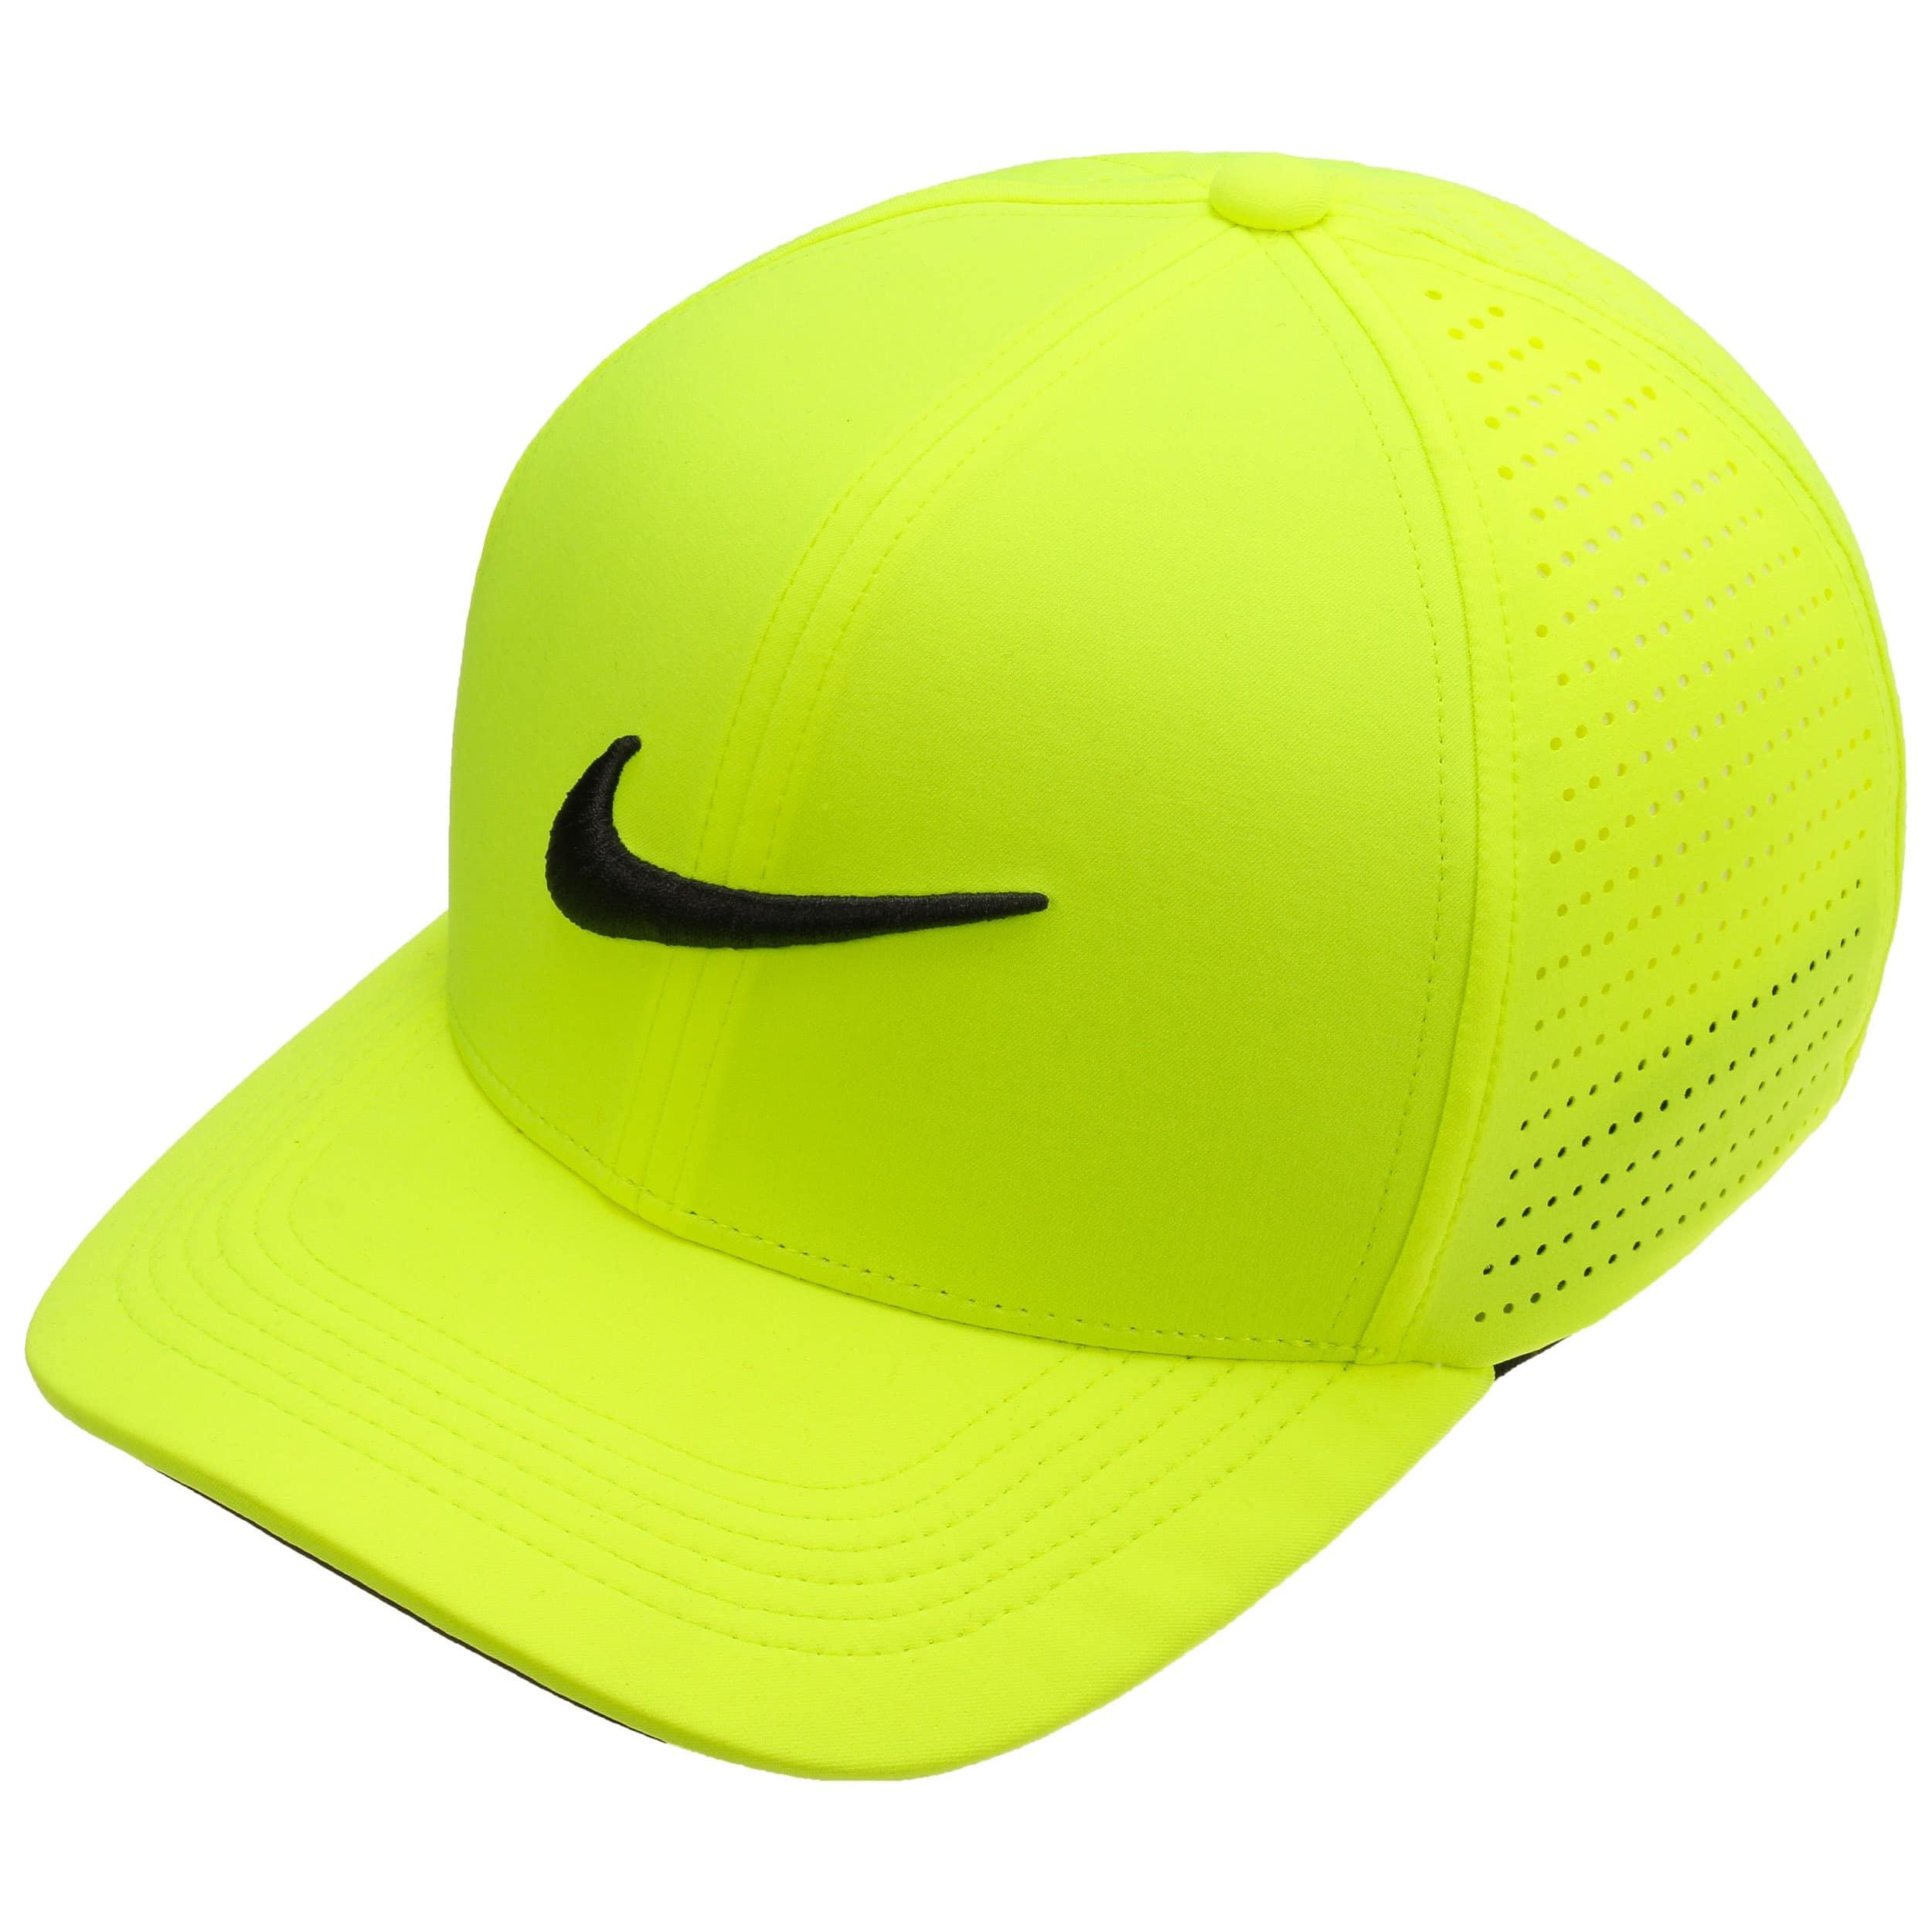 Gorra Golf Classic 99 Baseball by Nike - Gorras - sombreroshop.es 9accb777740